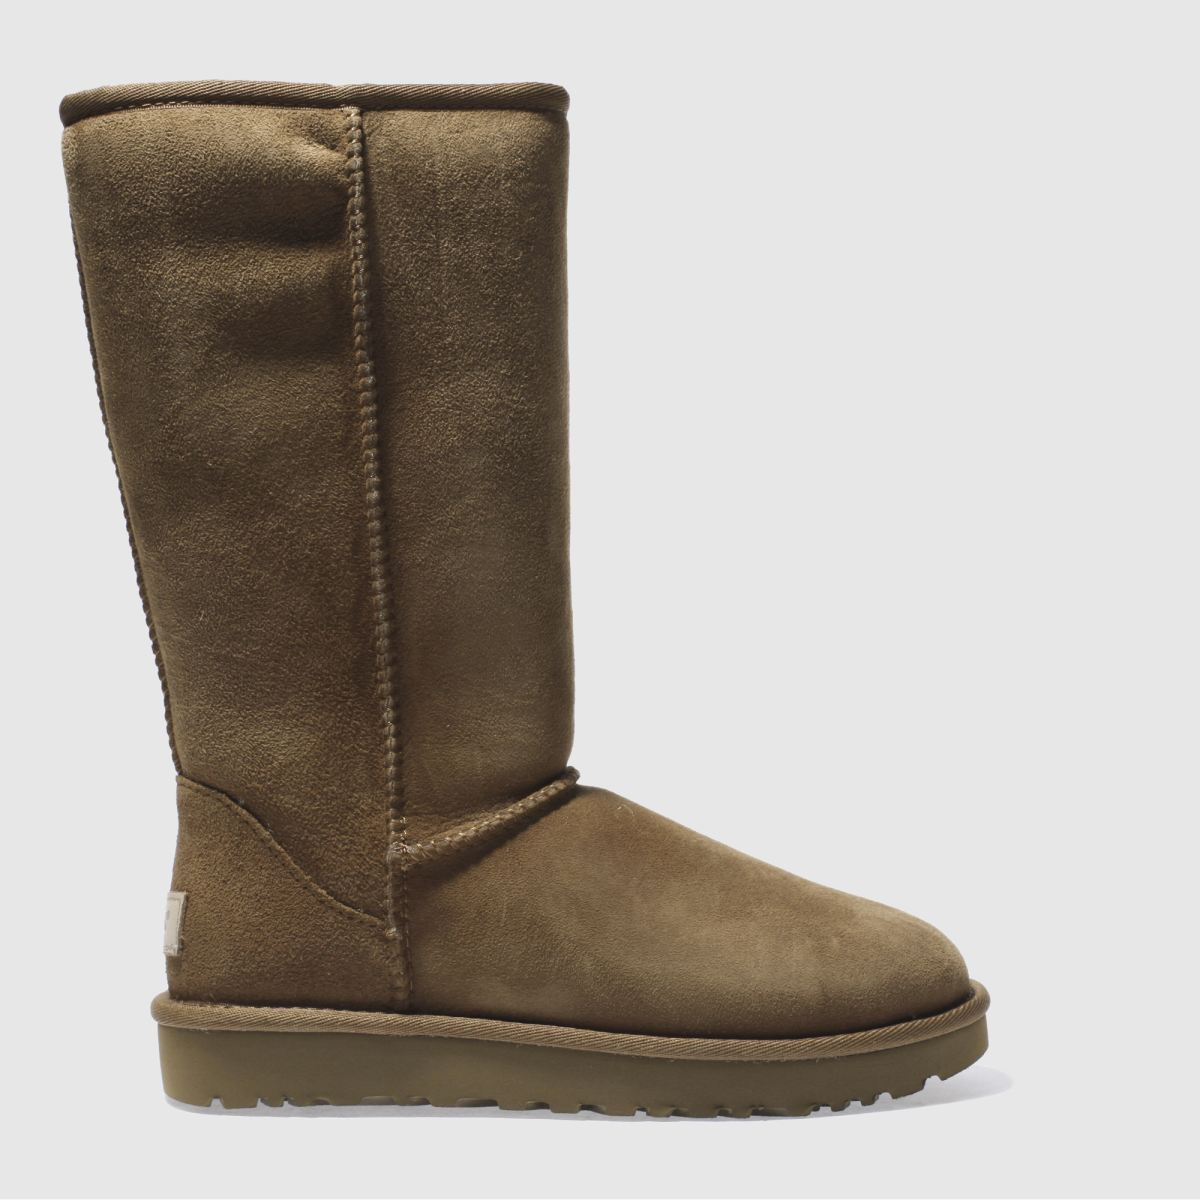 Ugg Tan Classic Tall Ii Boots